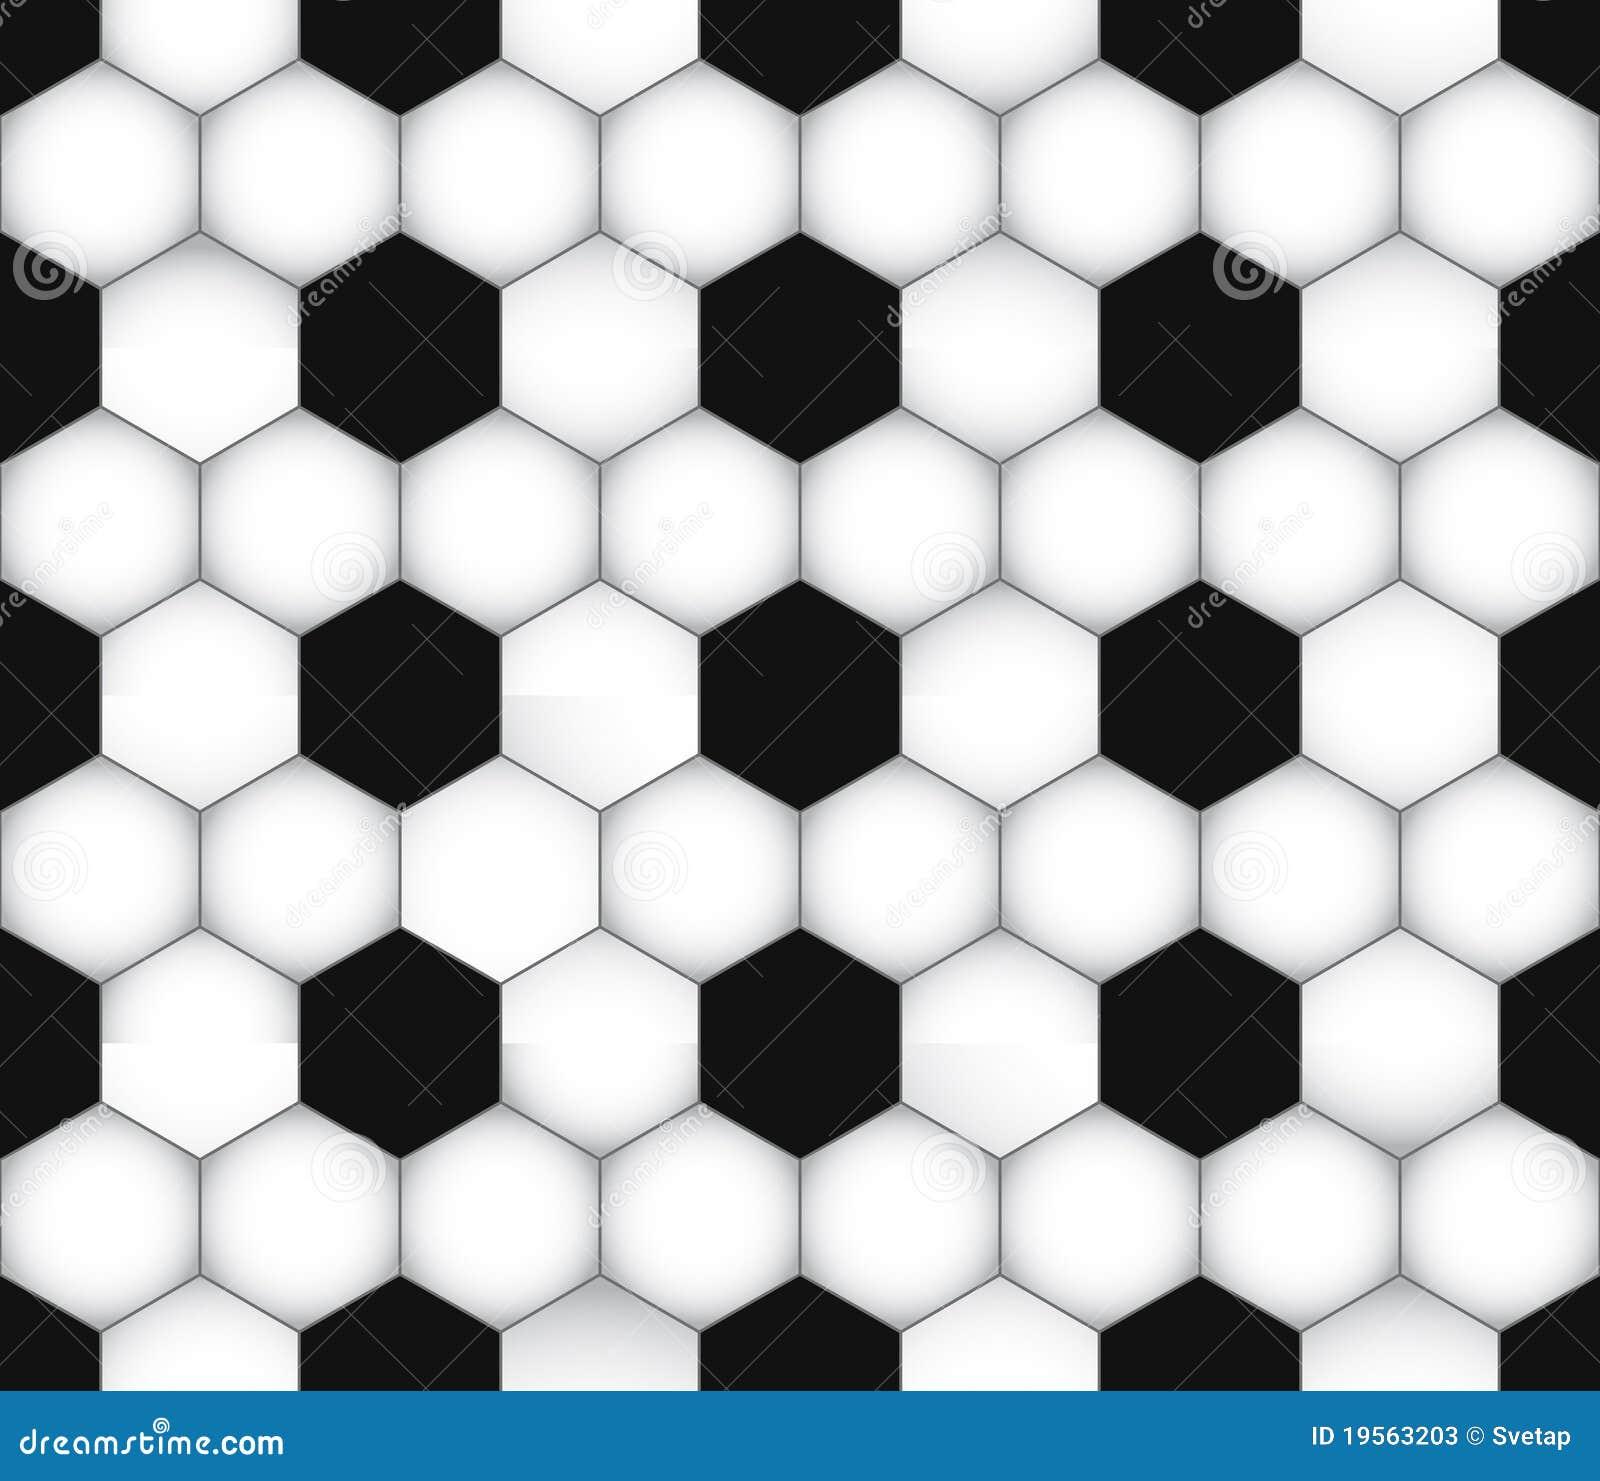 Soccer Seamless Texture Stock Photos - Image: 19563203